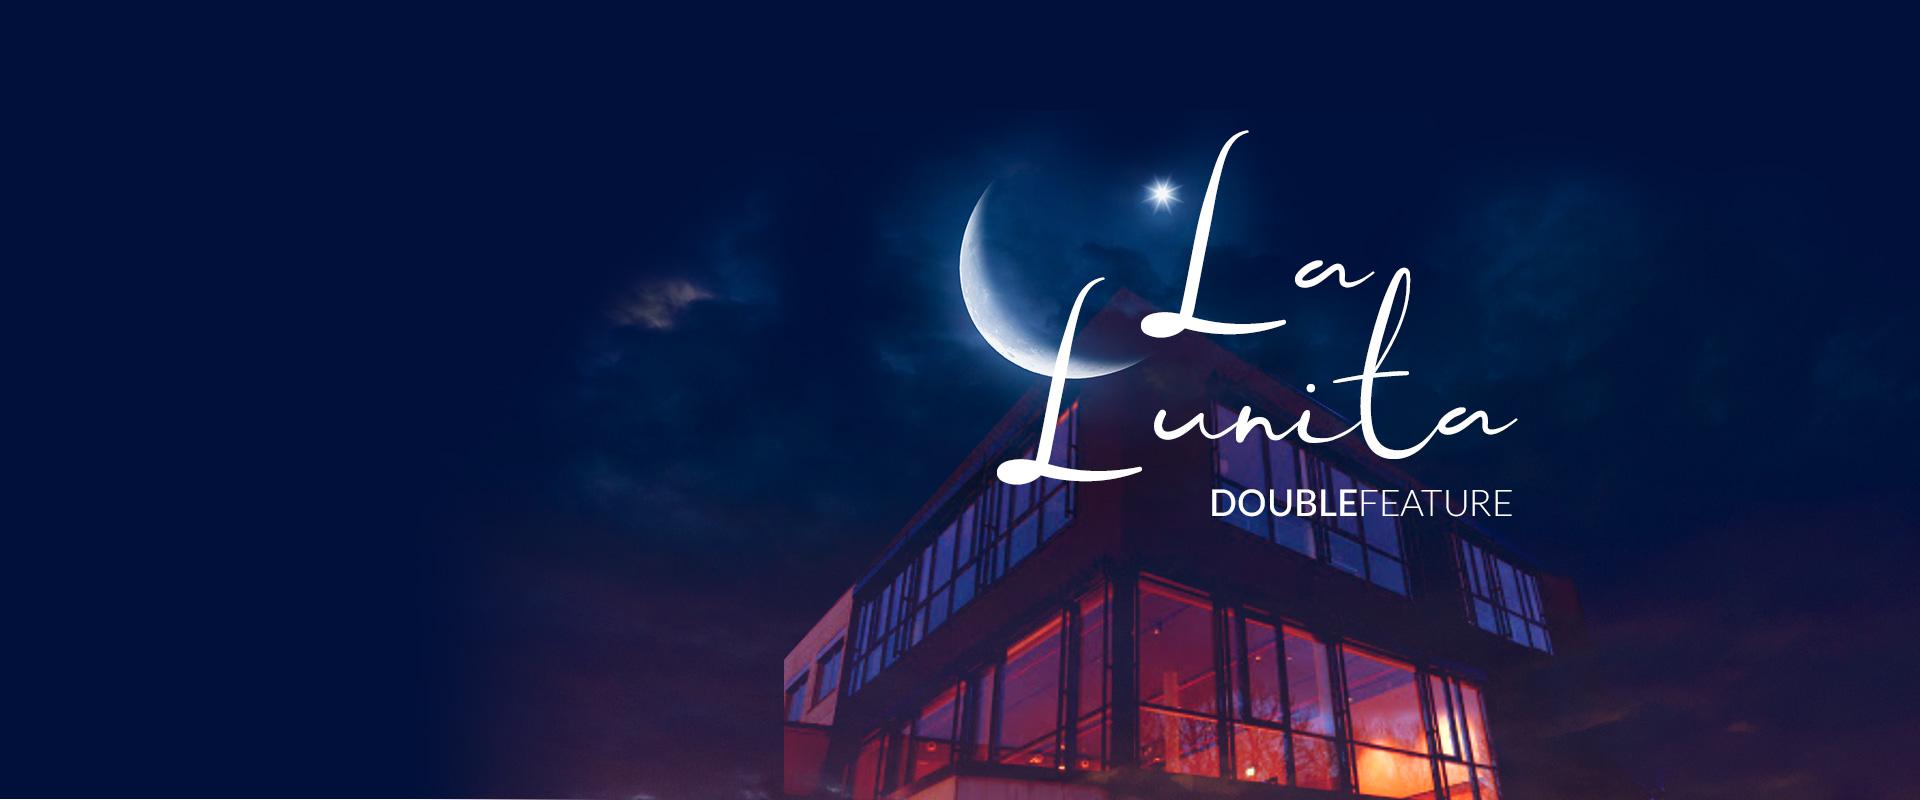 TANGOmaldito La Lunita Double Feature - Die Milonga für Aficionados